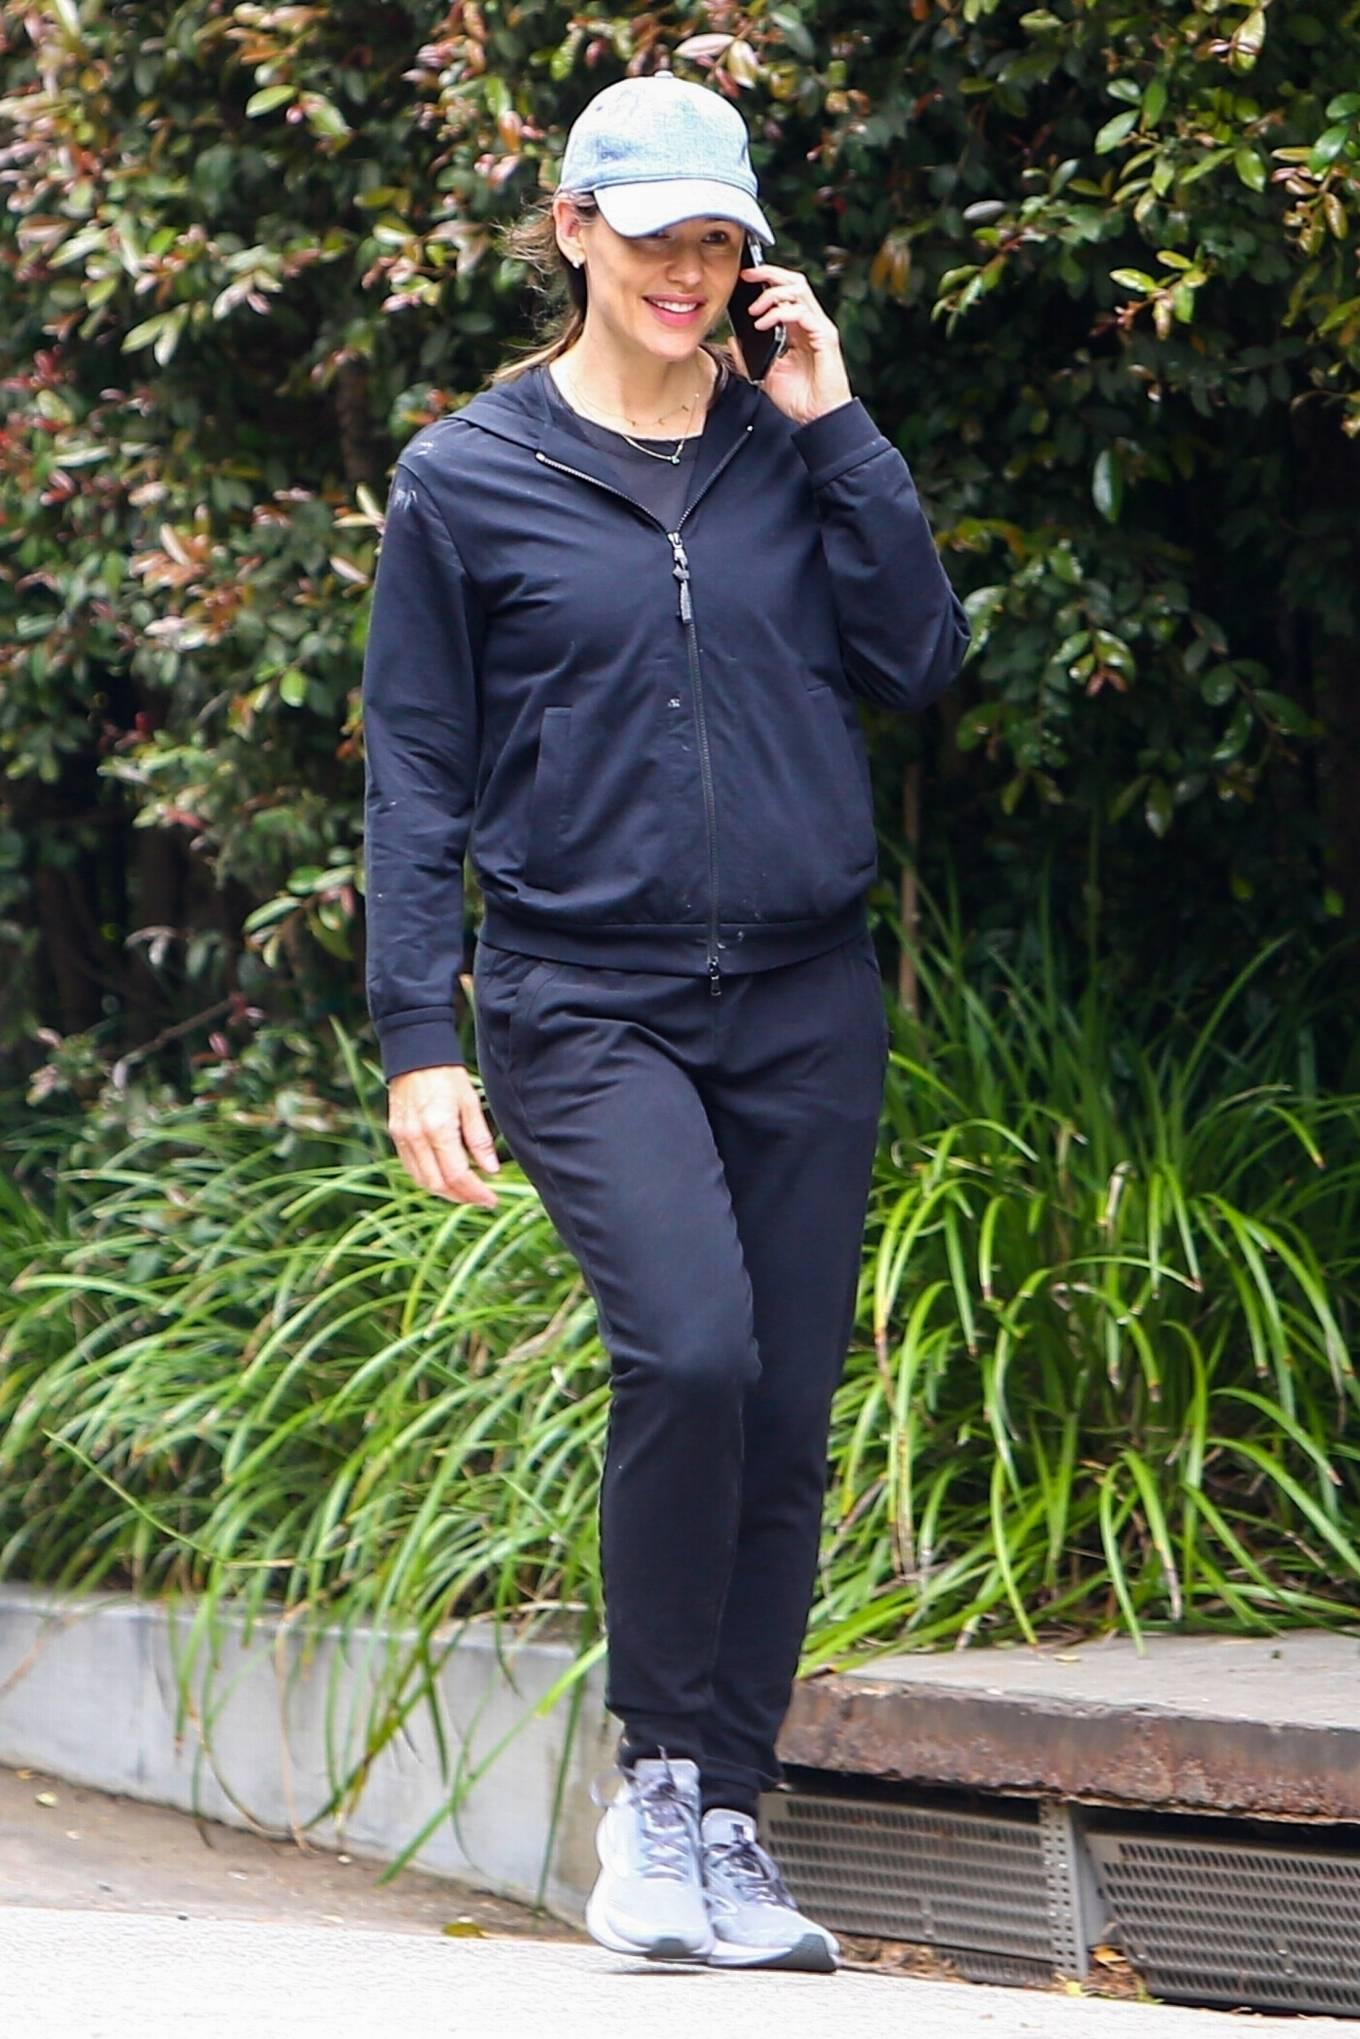 Jennifer Garner - morning walk through her Brentwood neighborhood